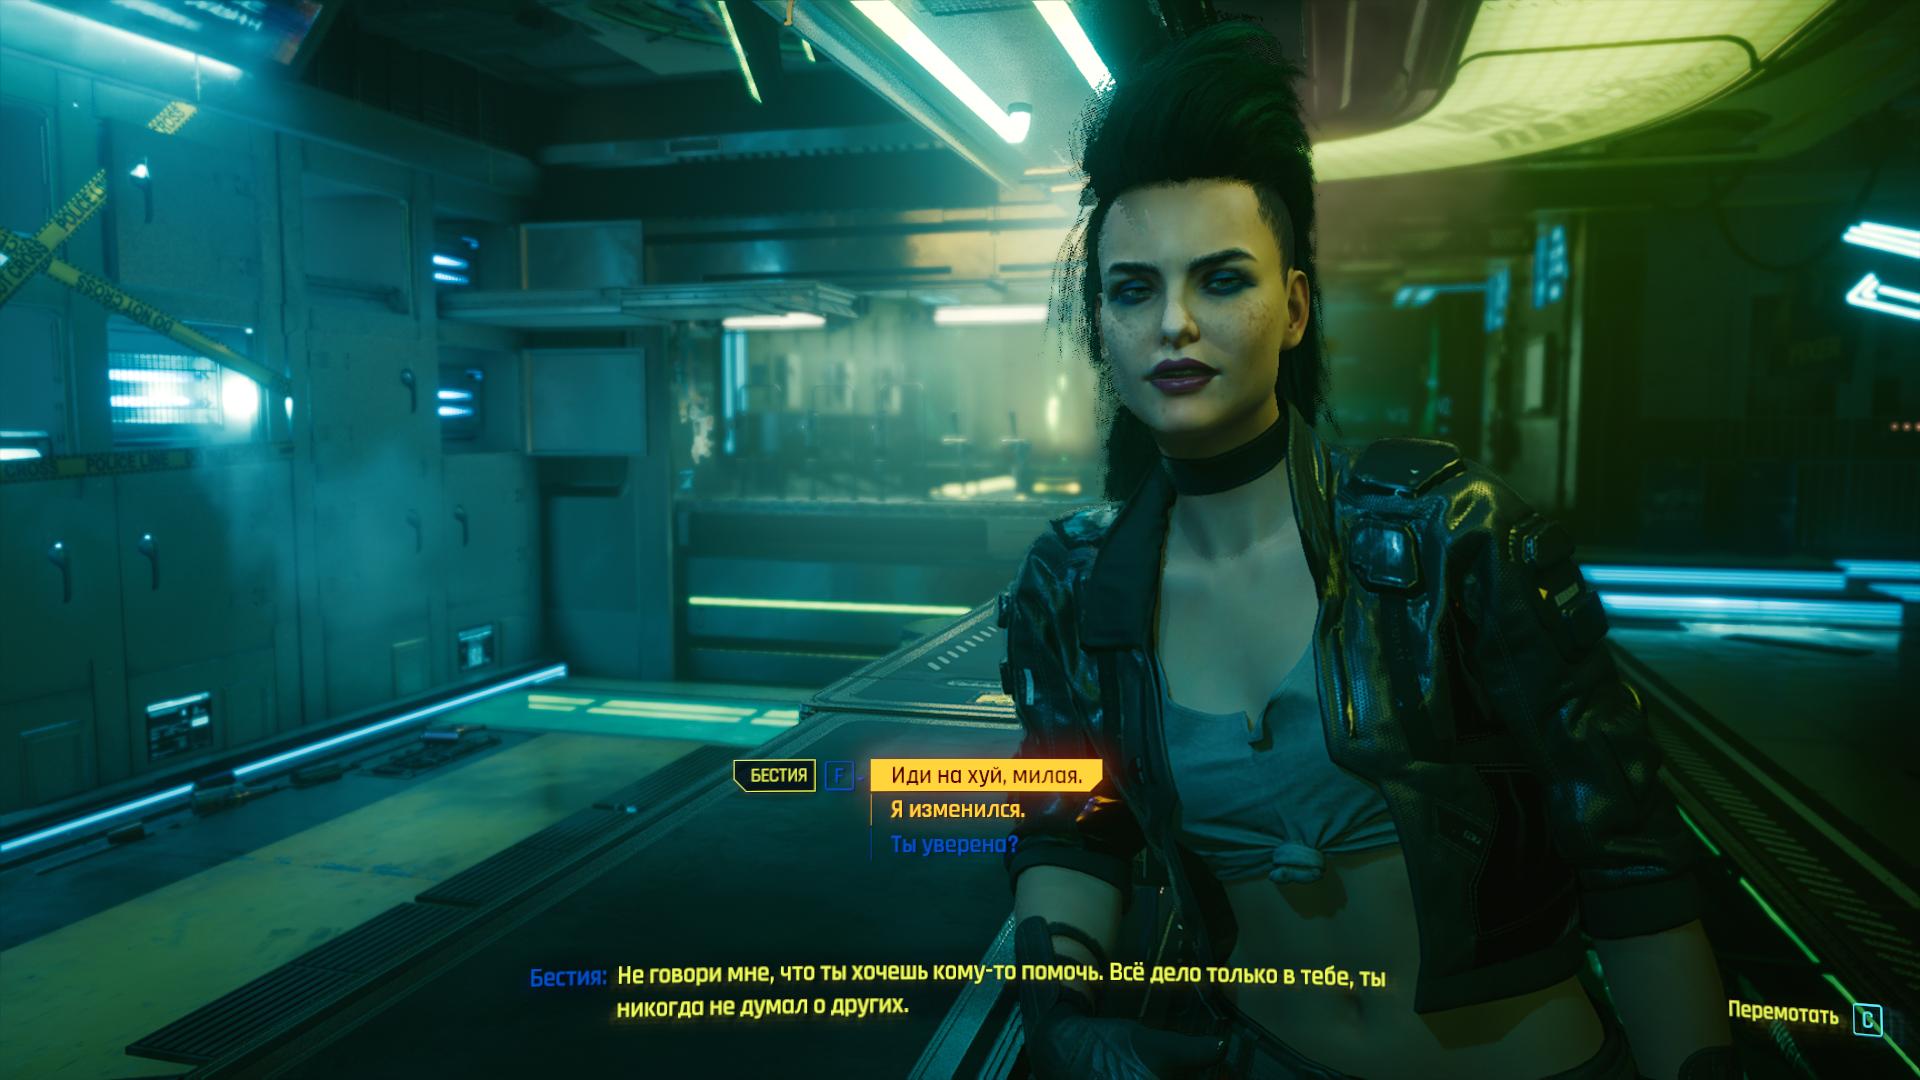 Cyberpunk 2077 Screenshot 2021.01.12 - 02.30.35.72.png - Cyberpunk 2077